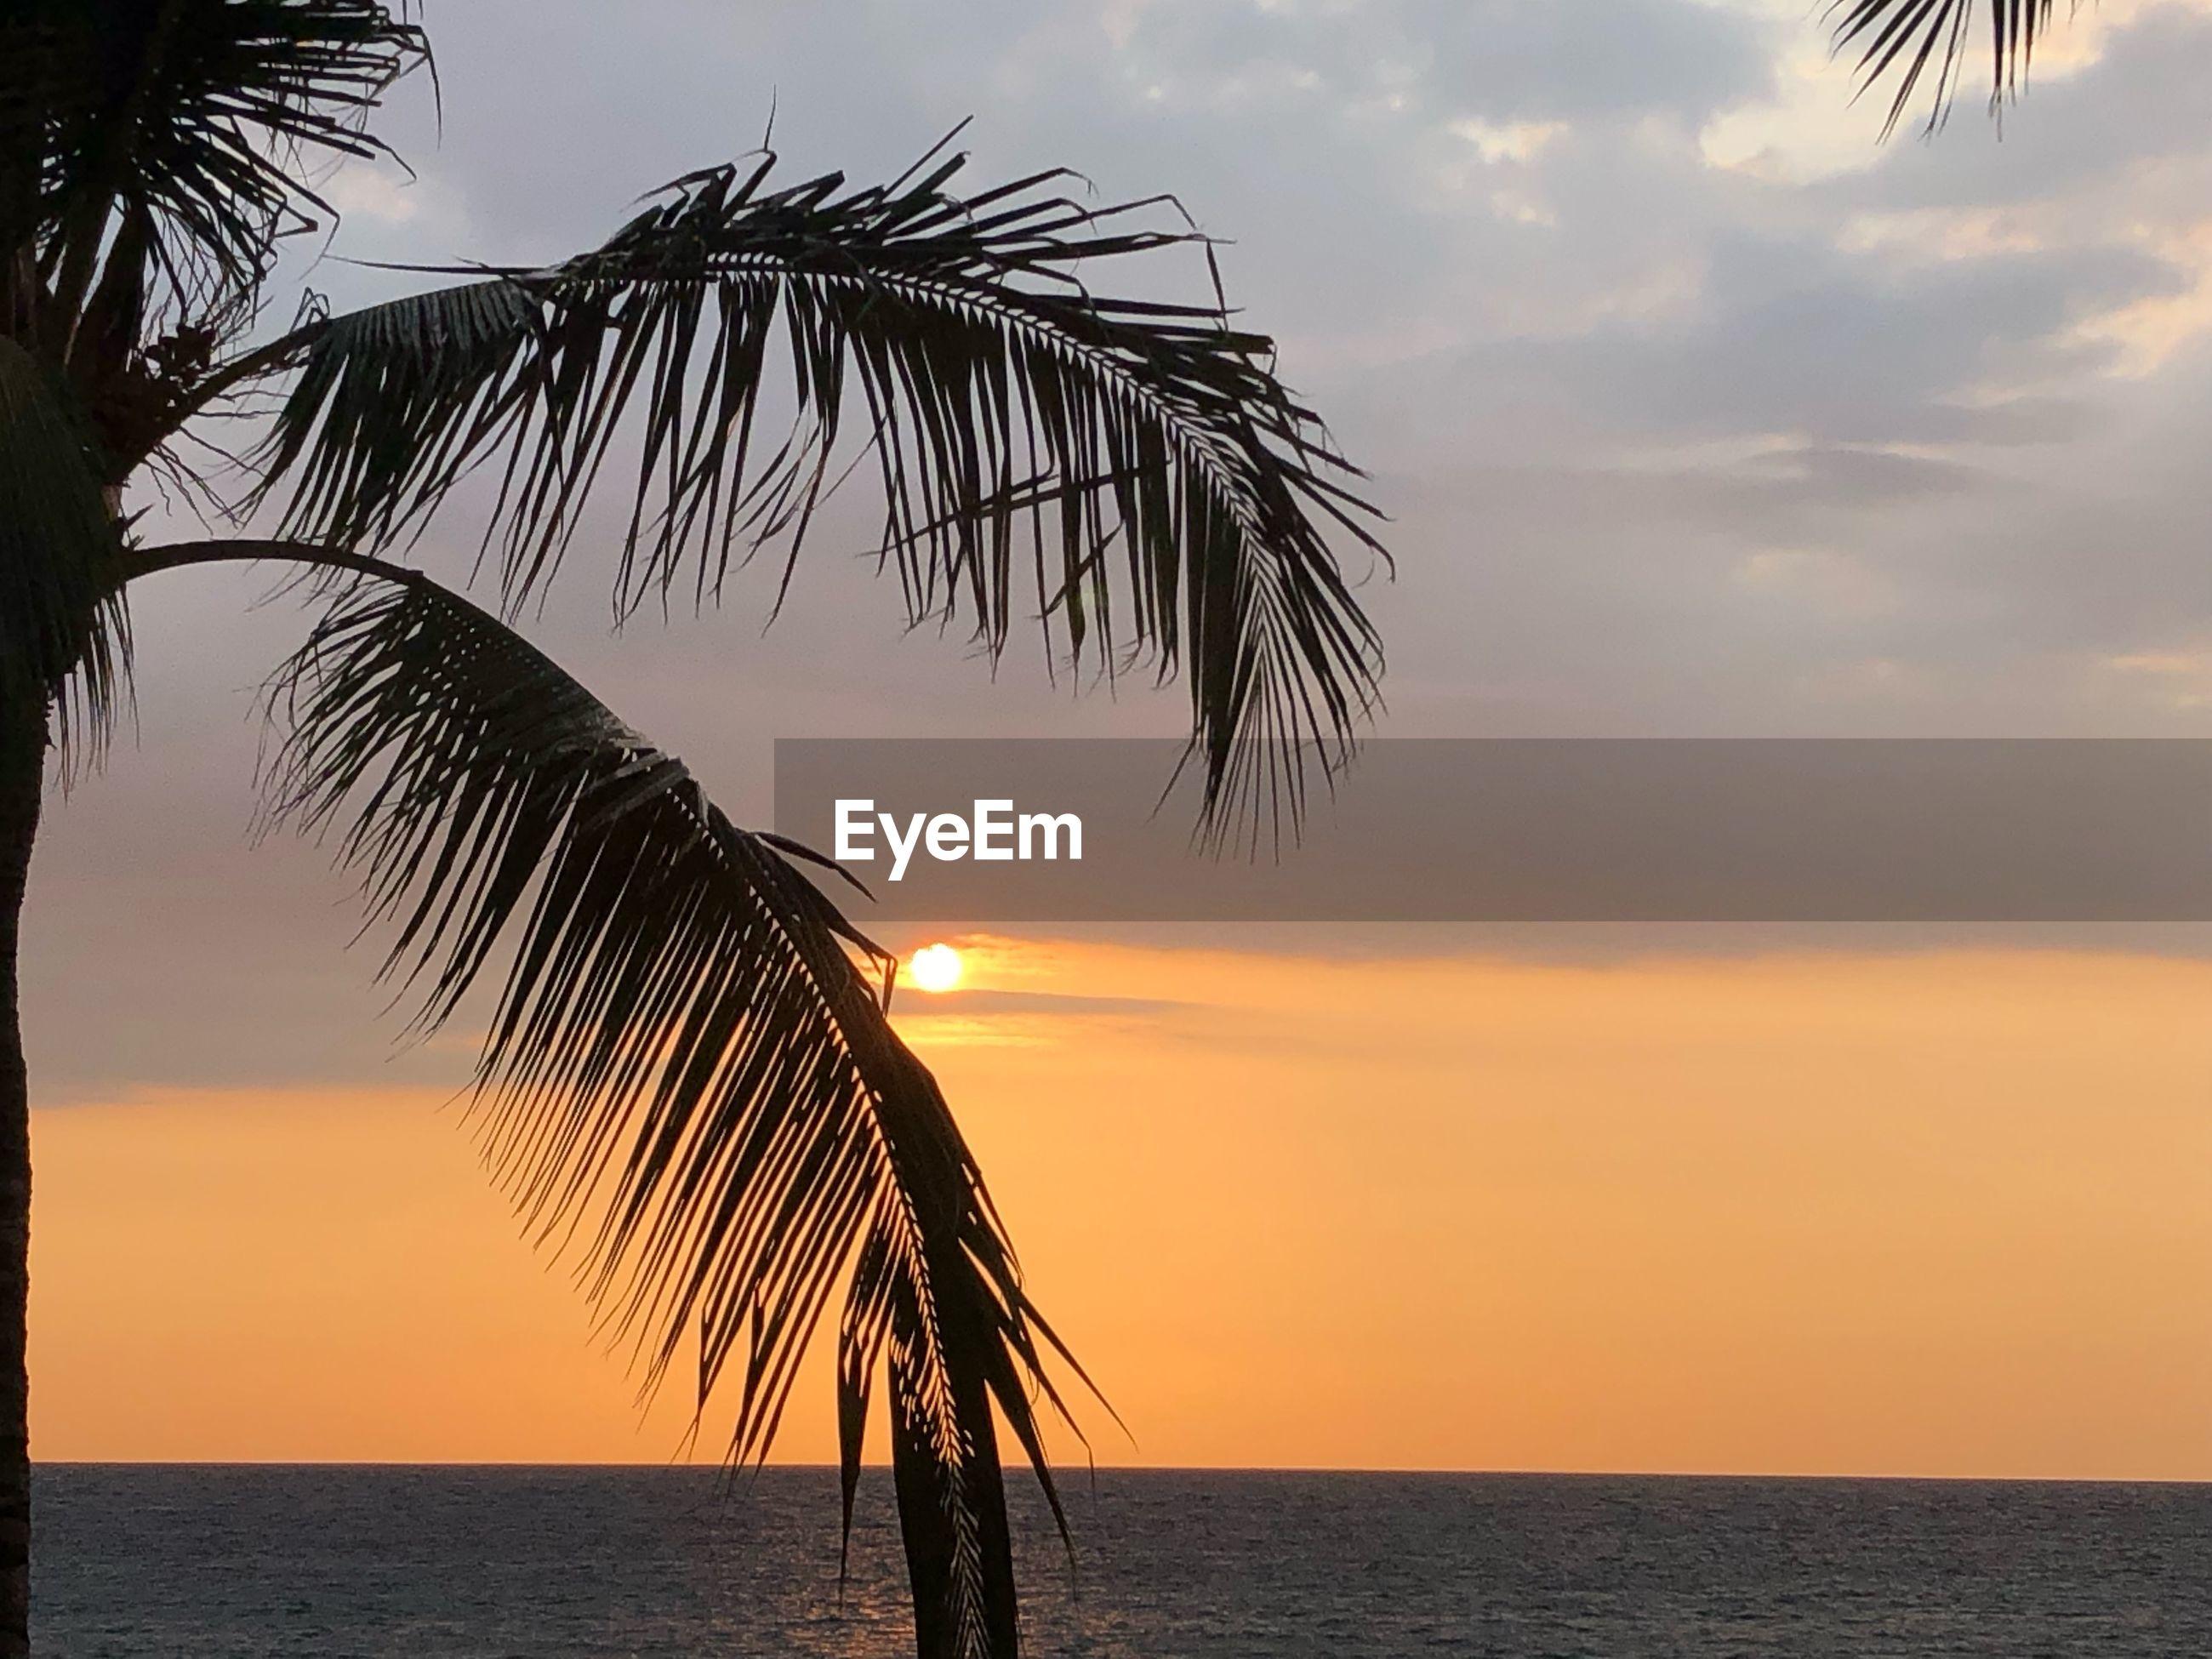 SILHOUETTE PALM TREE BY SEA AGAINST ORANGE SKY